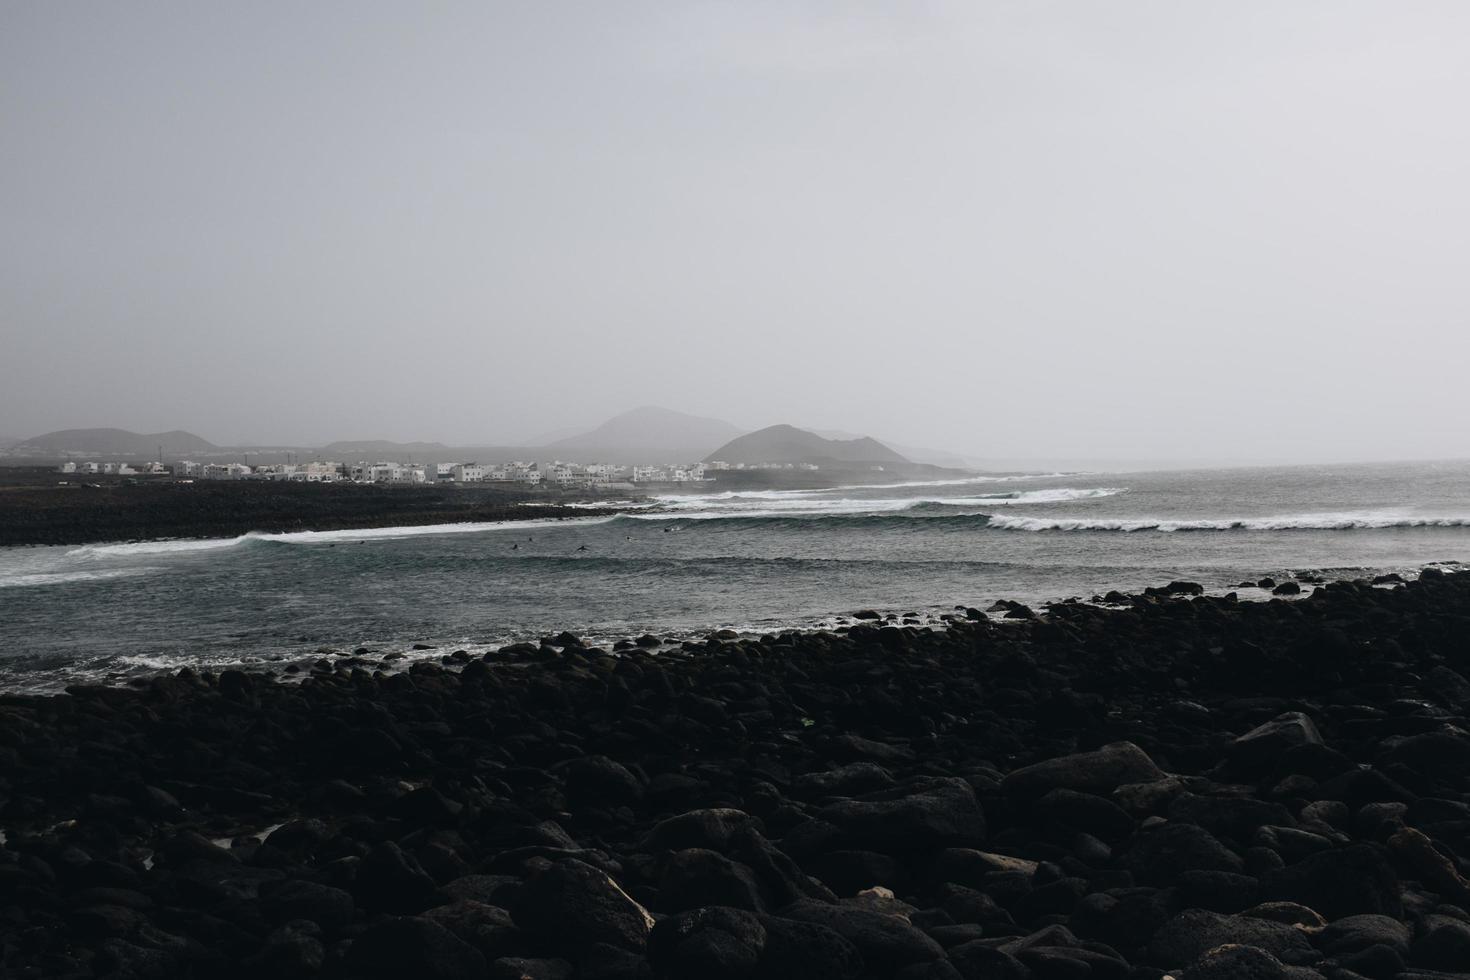 Ozean und Berge foto